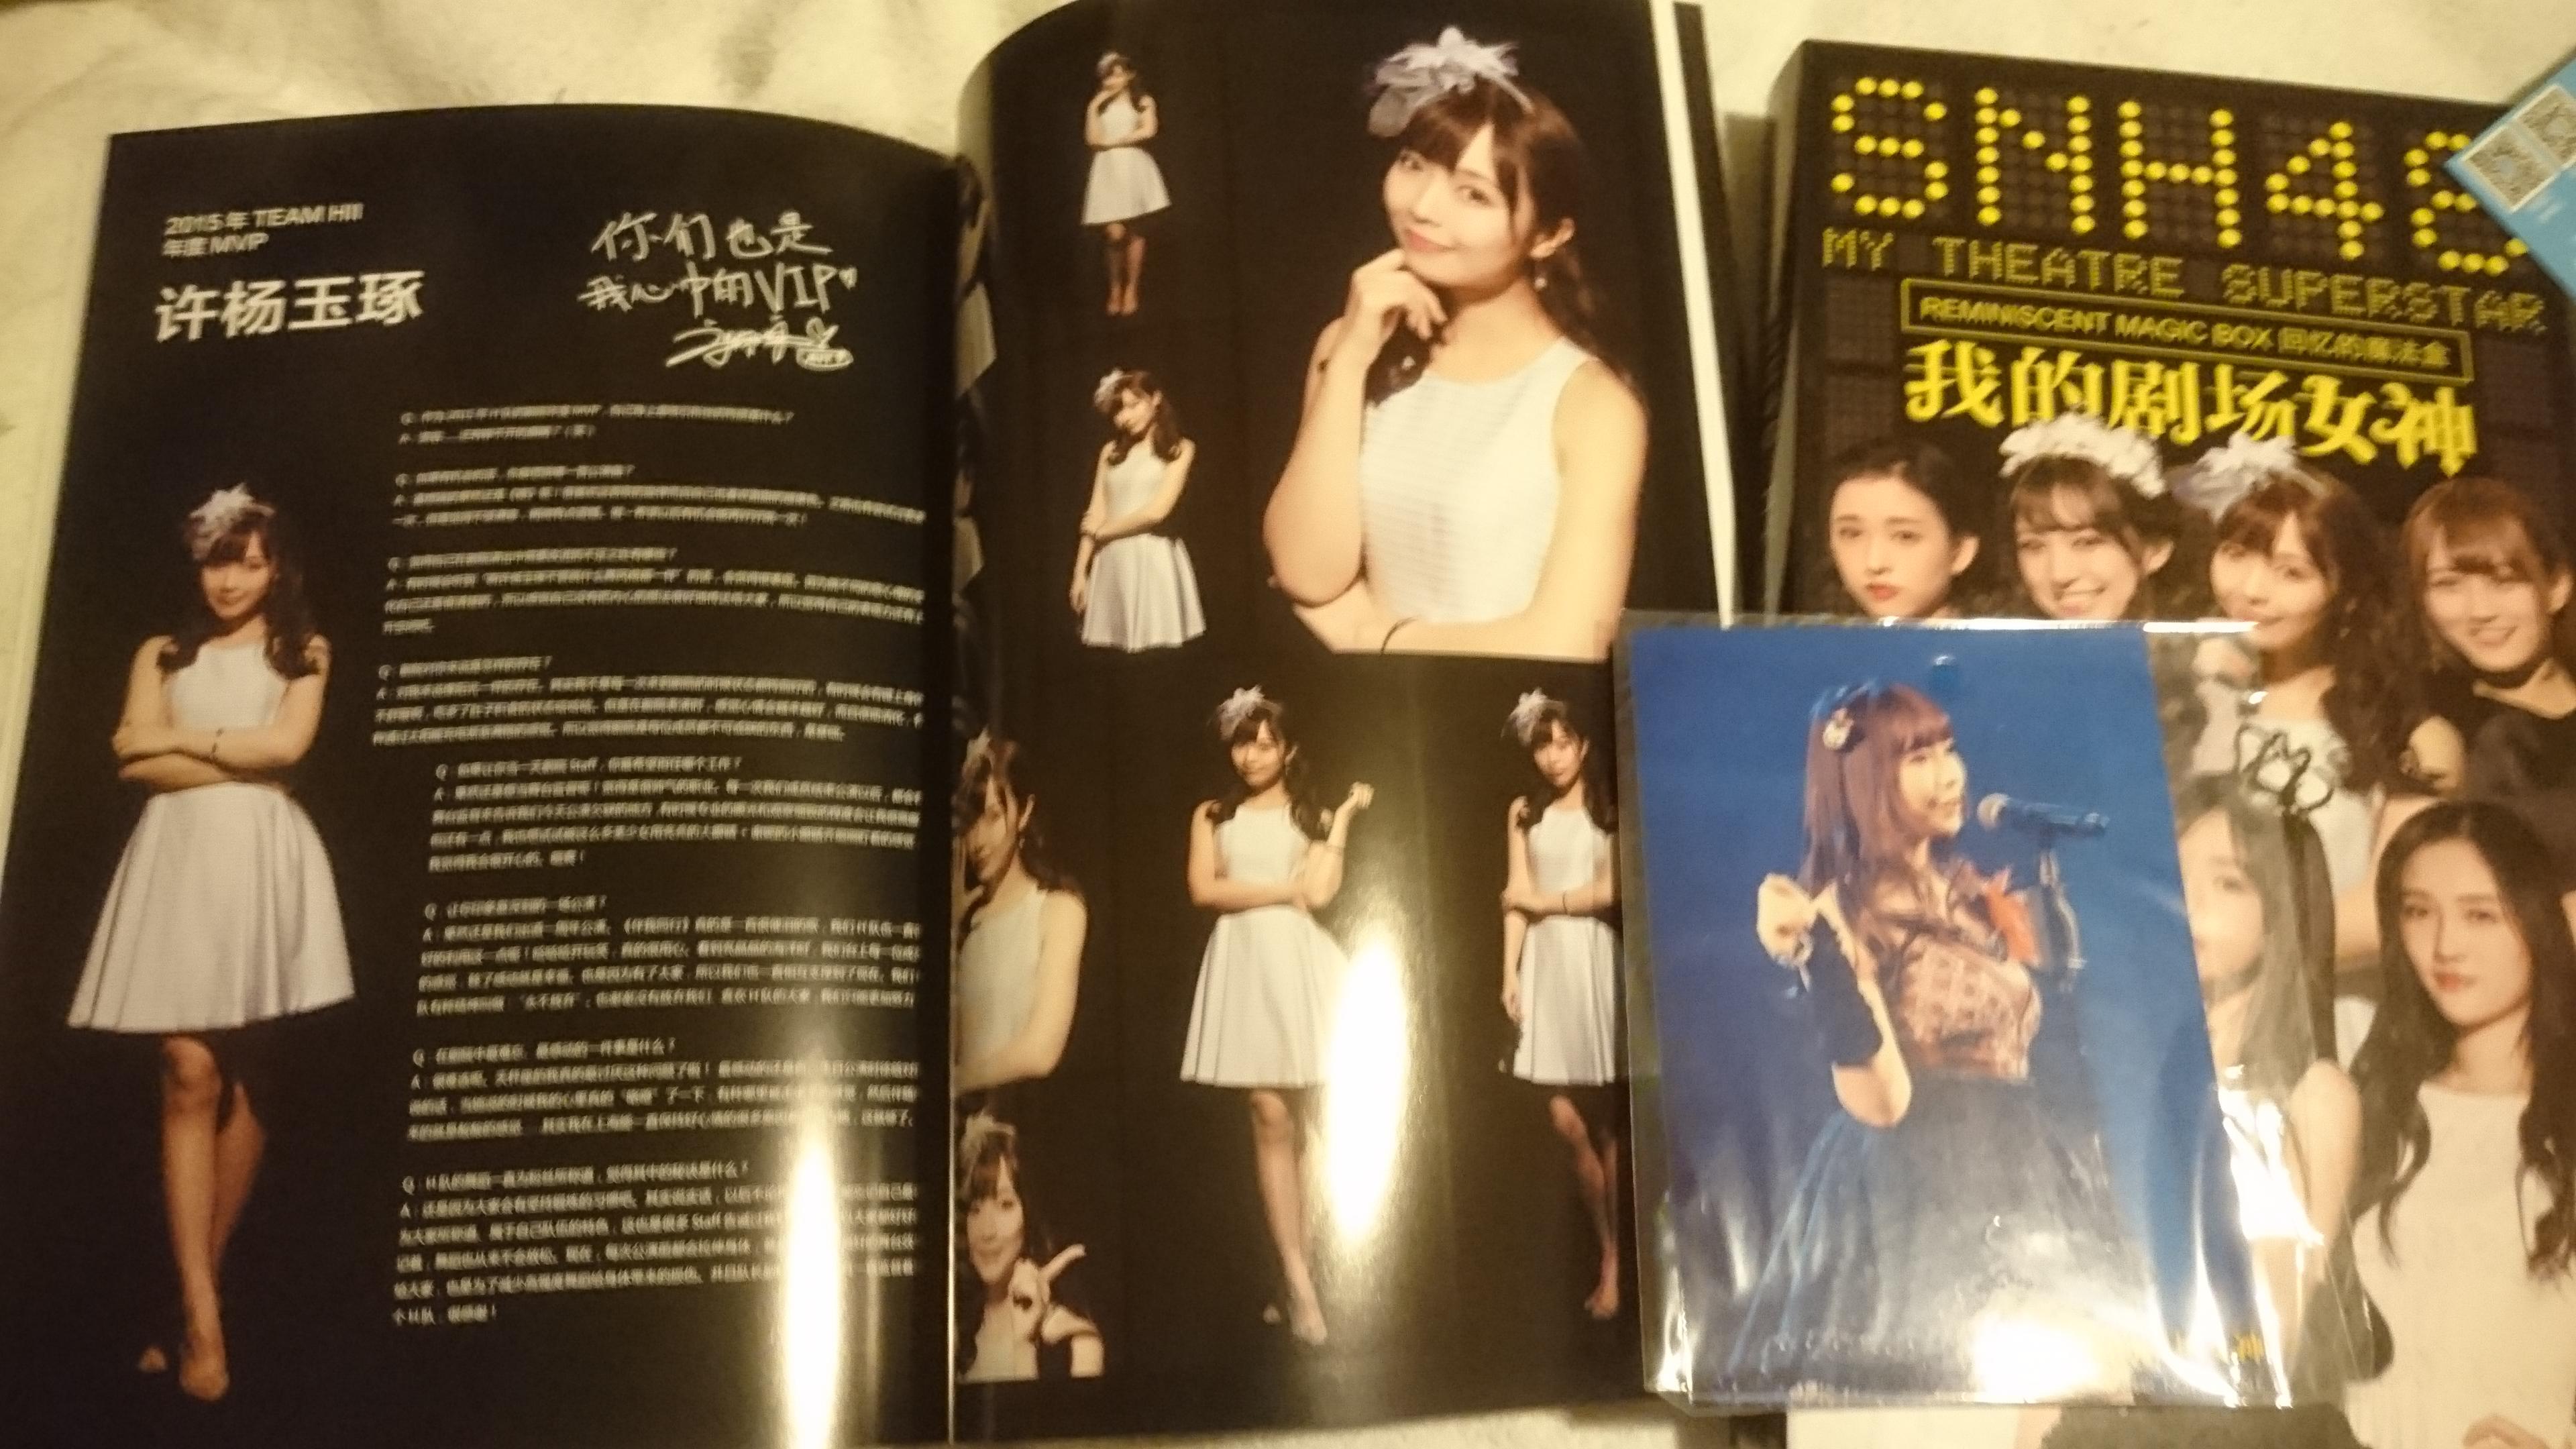 SNH48の最新DVD『我的劇場女神』を買ってみた!